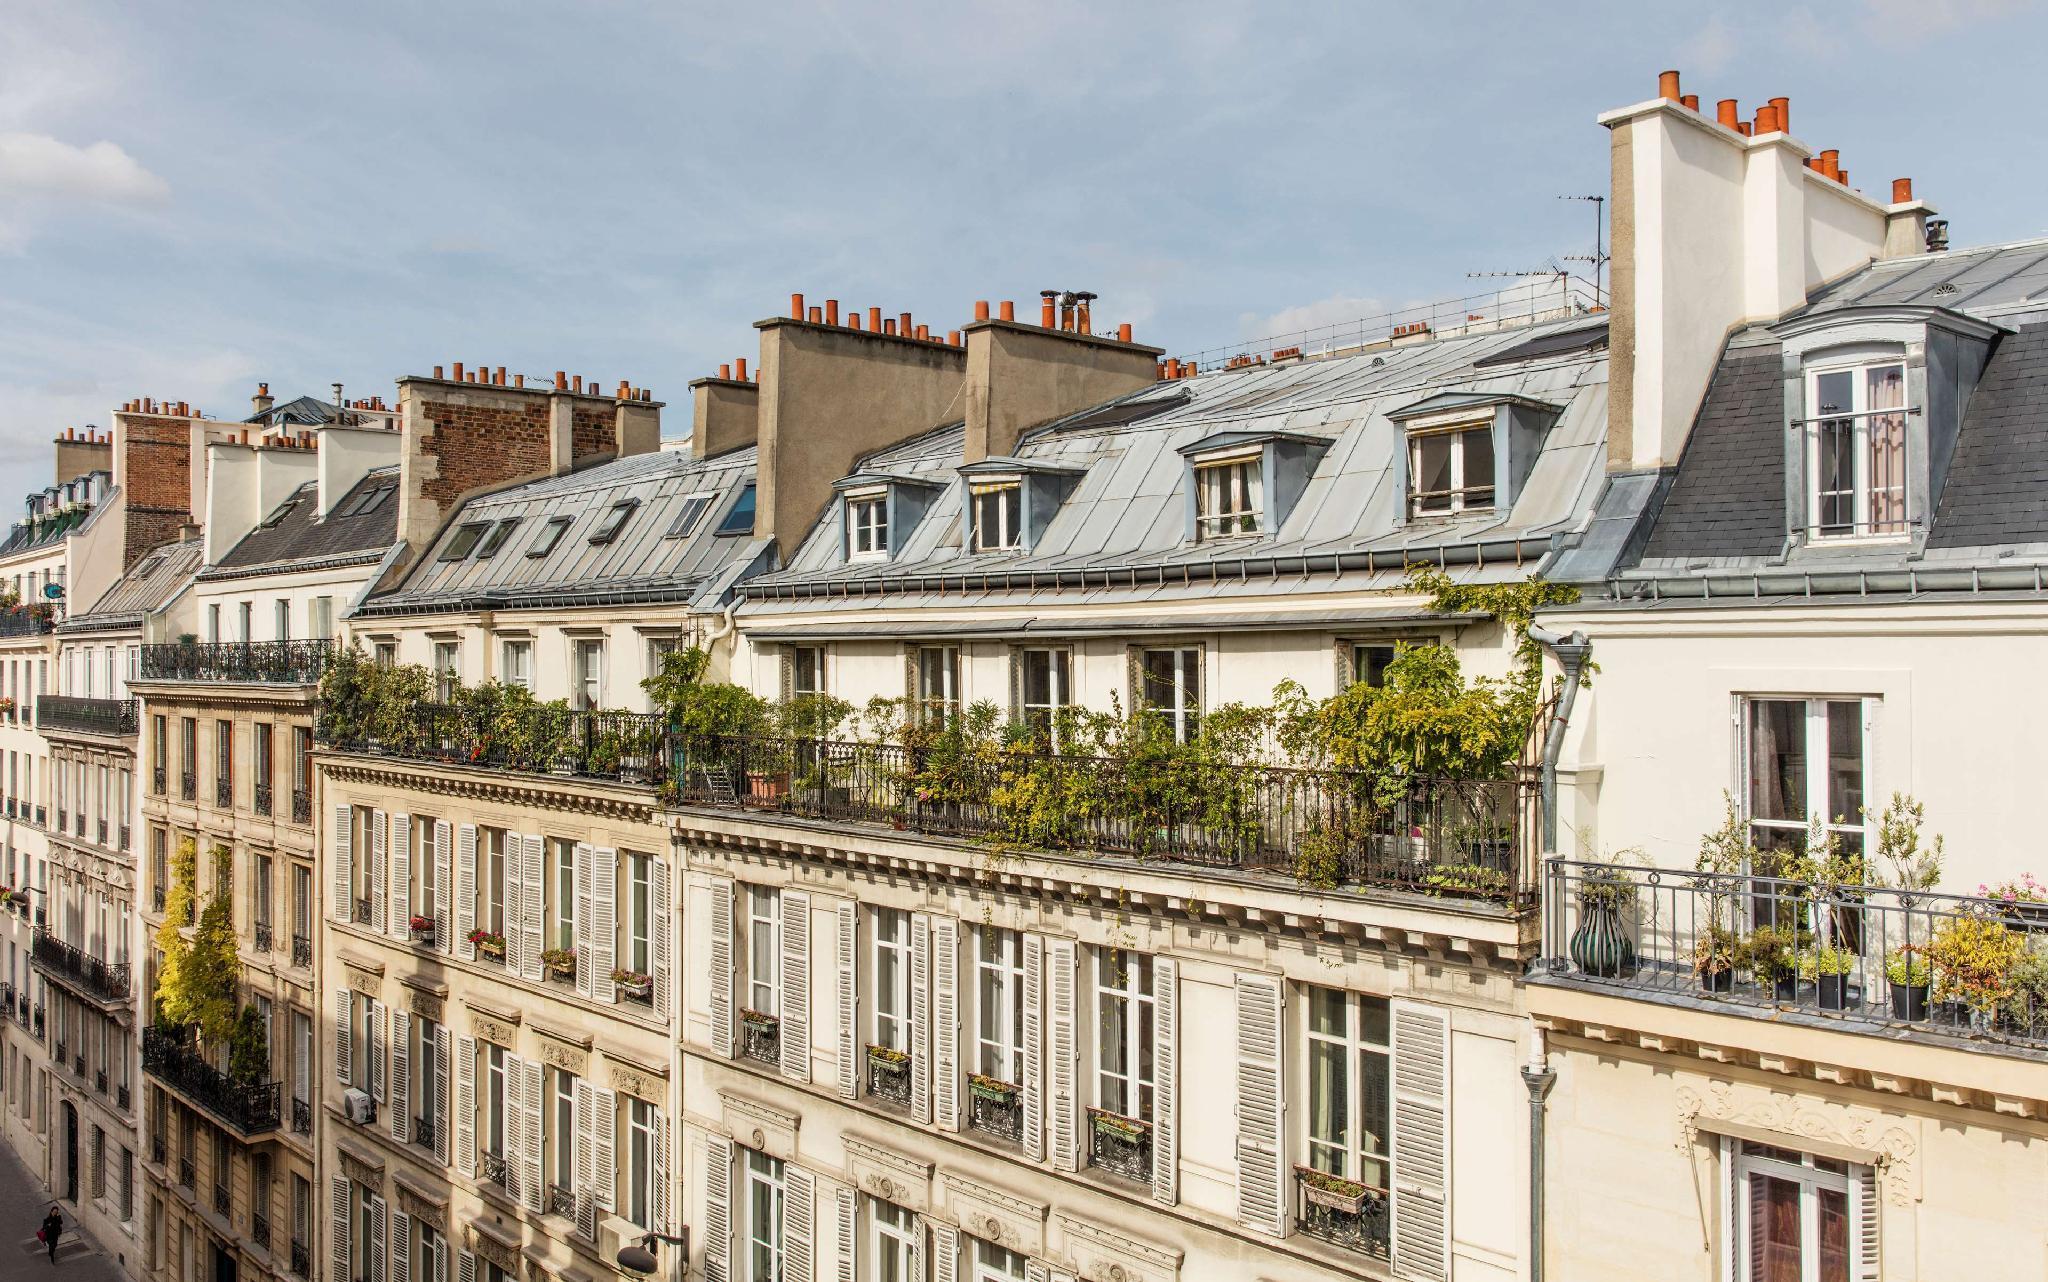 Staycation in Paris